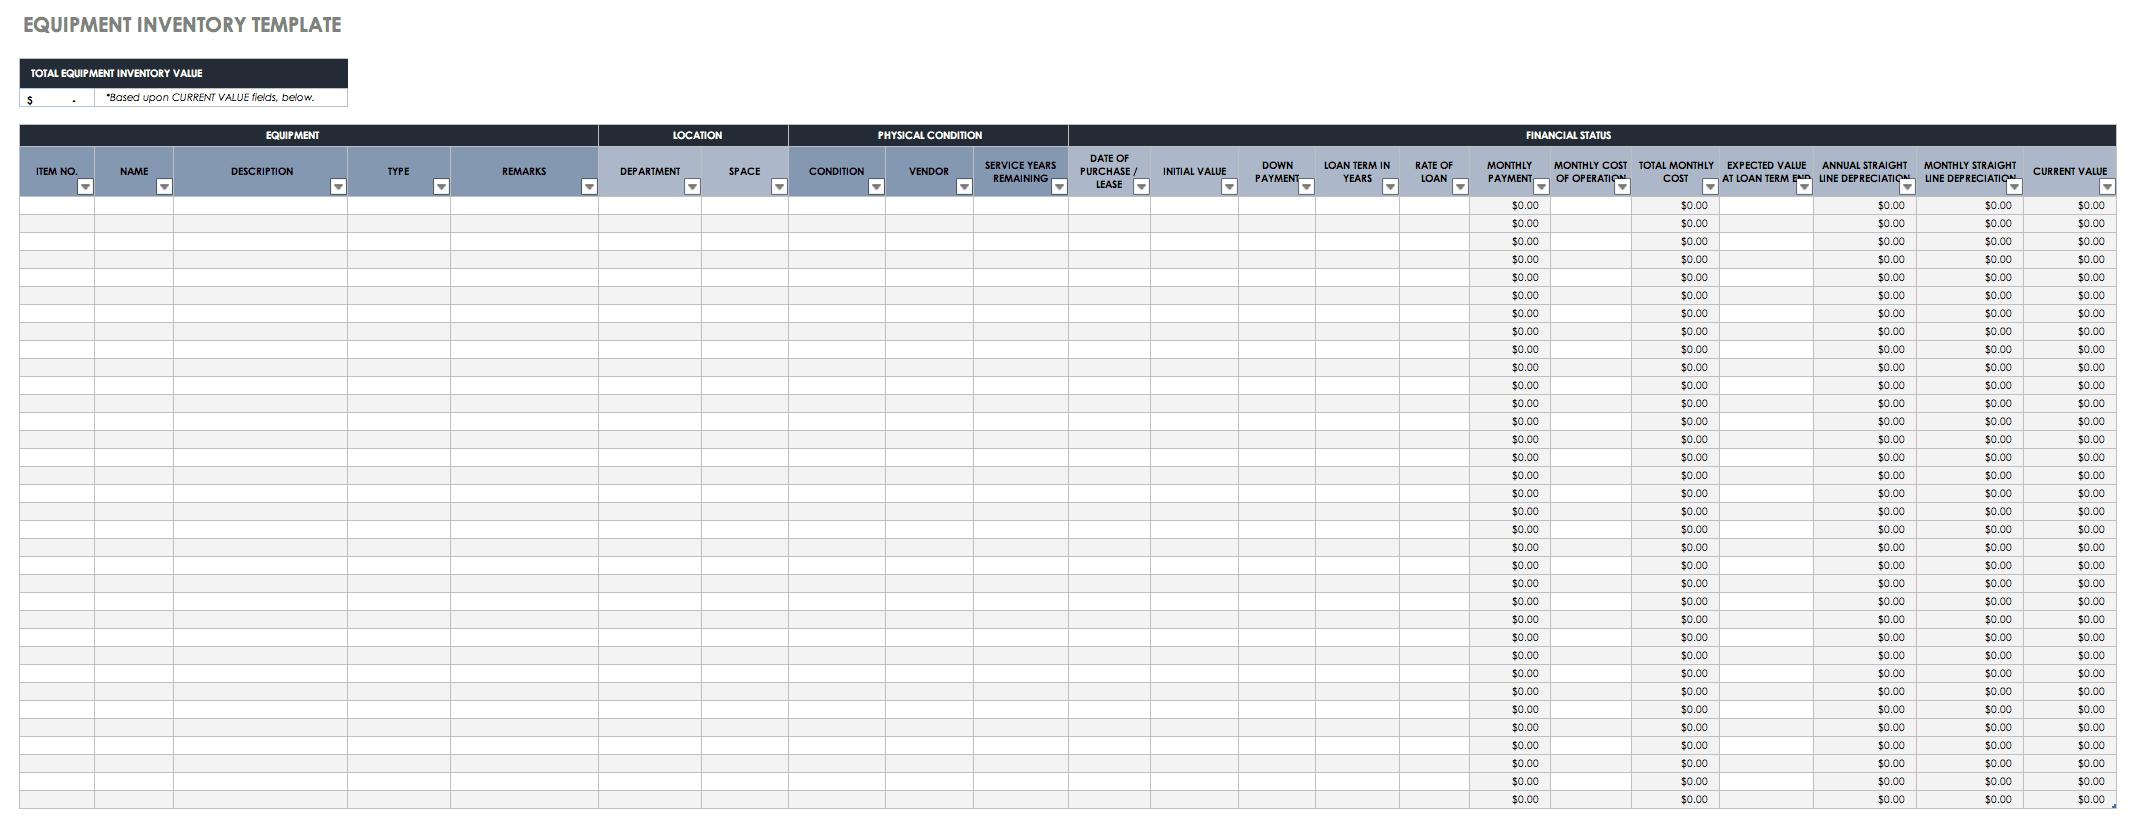 Spare Part Management Excel Template